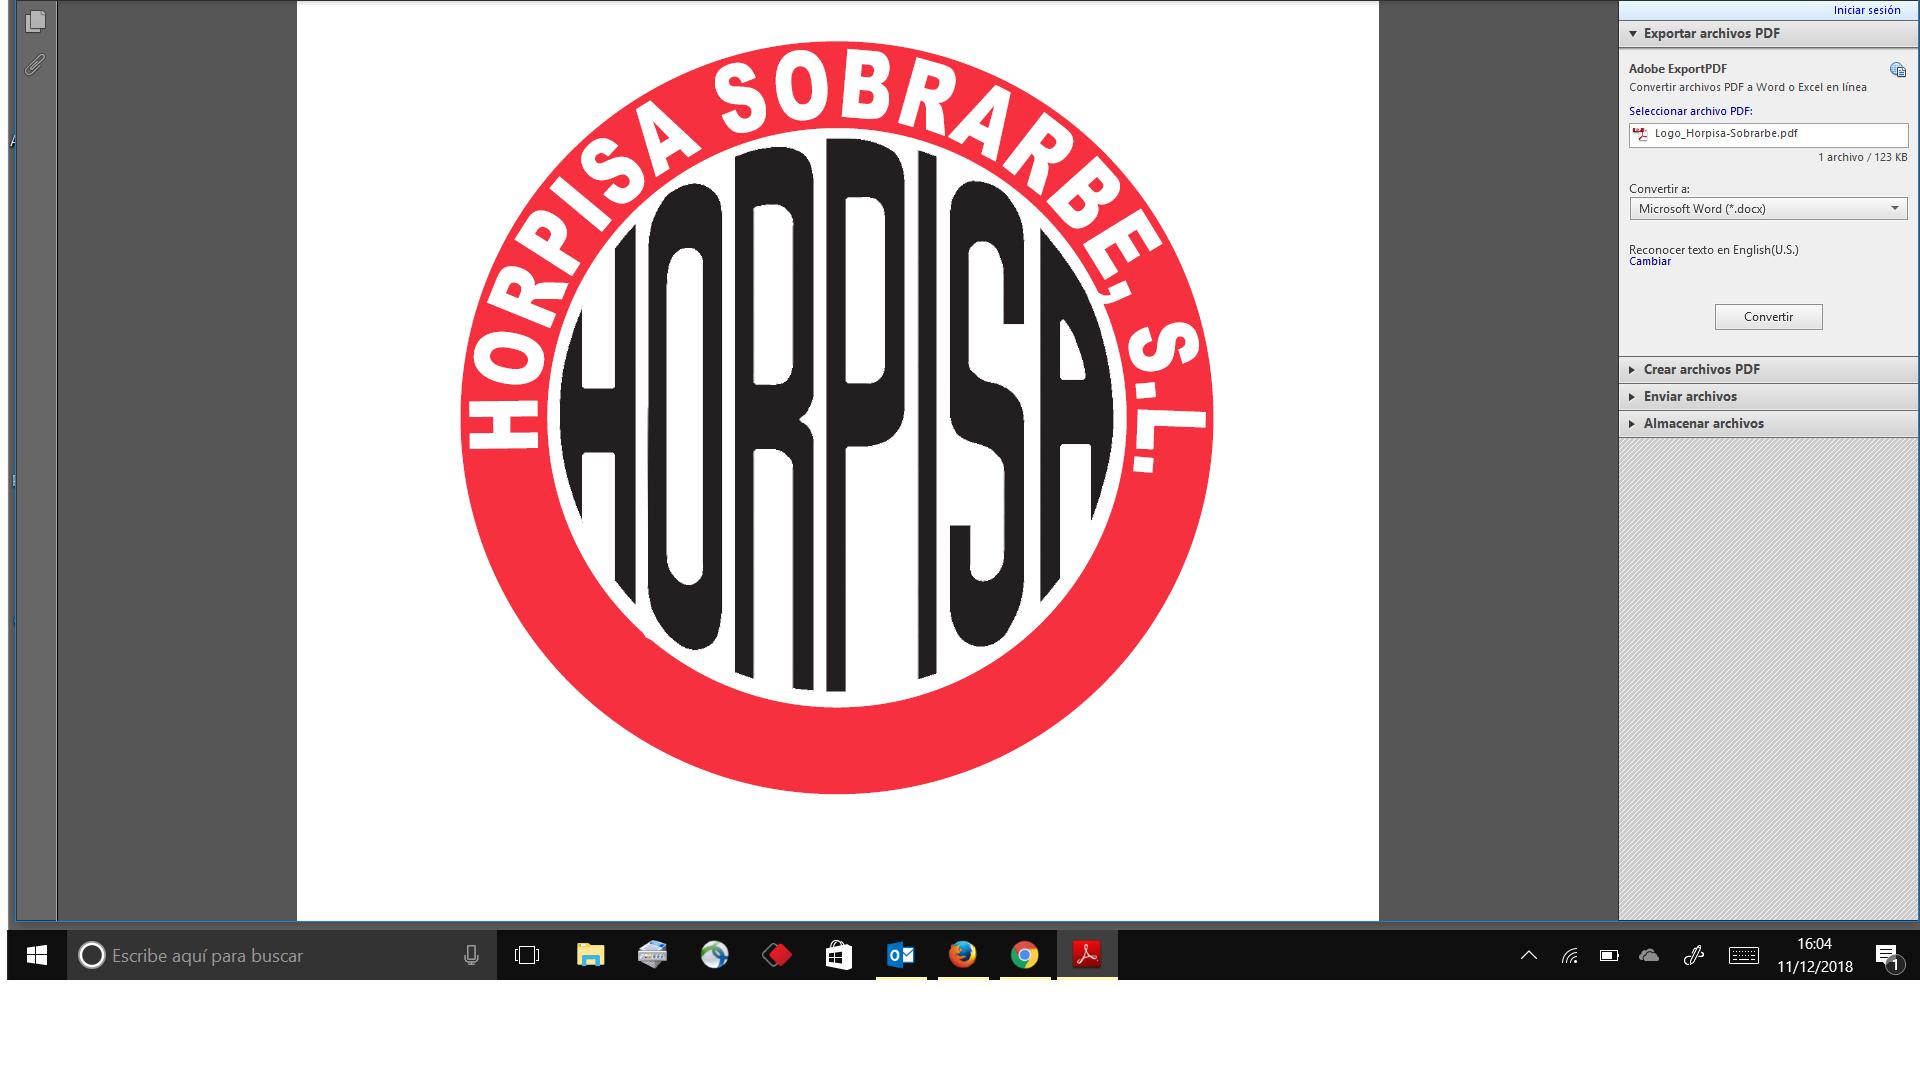 HORPISA SOBRARBE